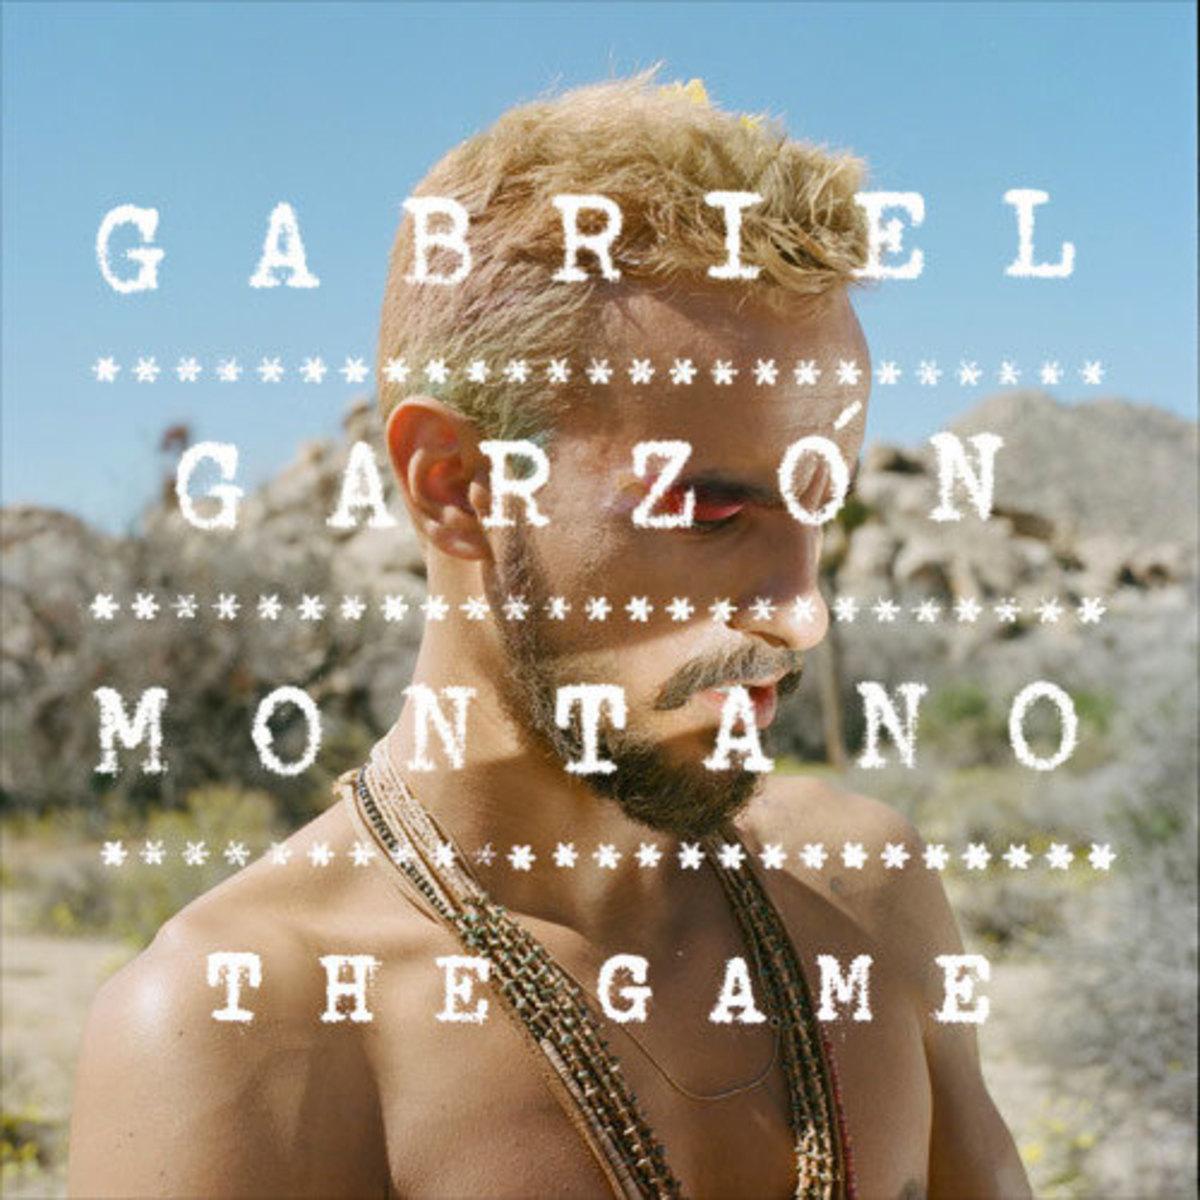 gabriel-garzon-montano-the-game.jpg